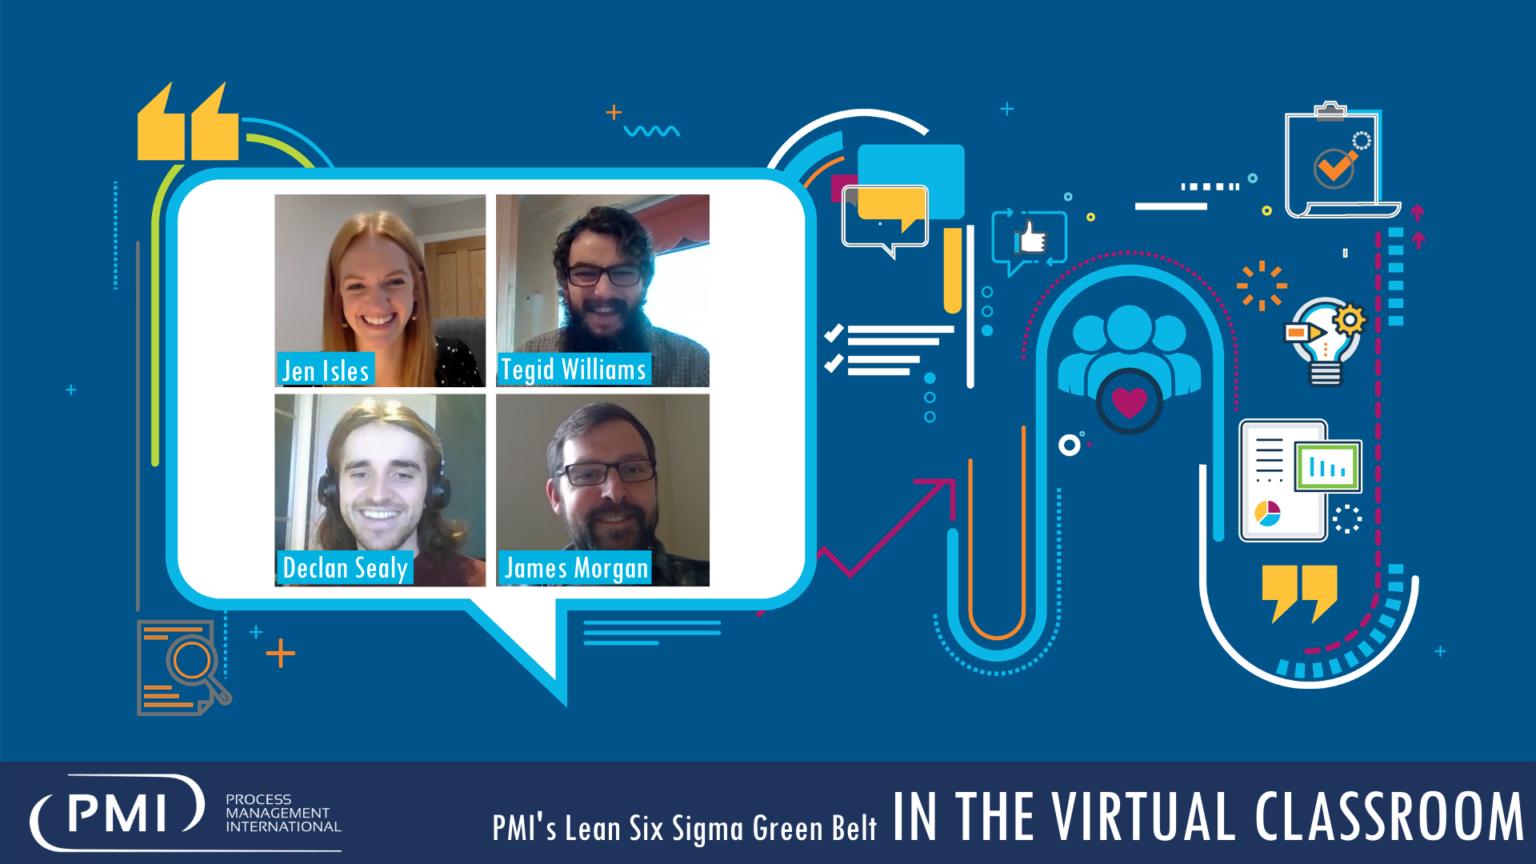 PMI's Lean Six Sigma Green Belt in the Virtual Classroom